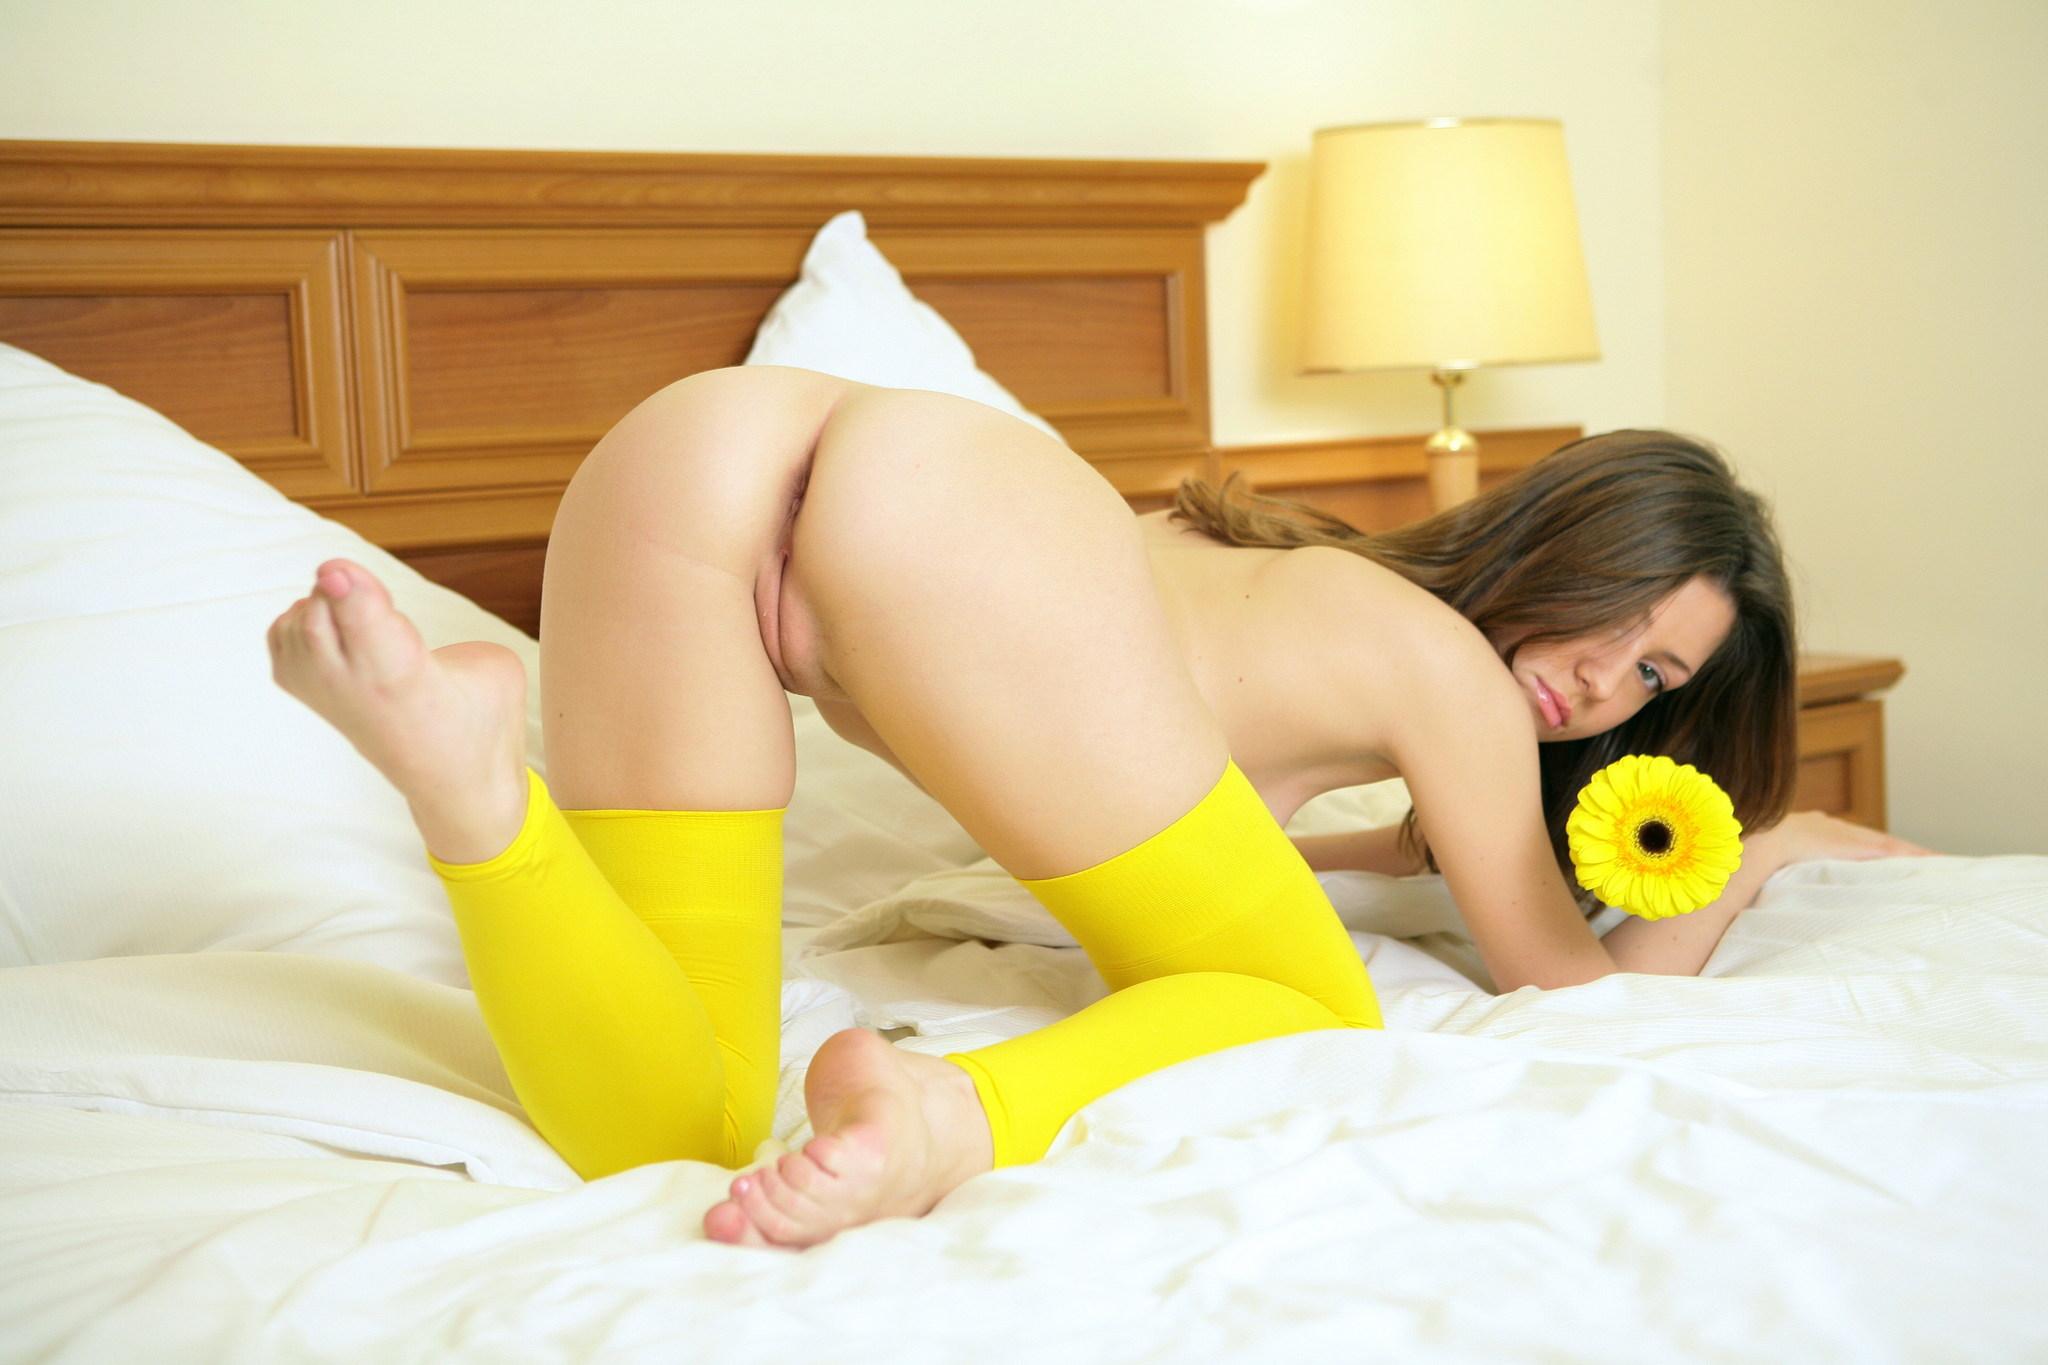 feet-fetish-nude-girls-foot-mix-vol5-74